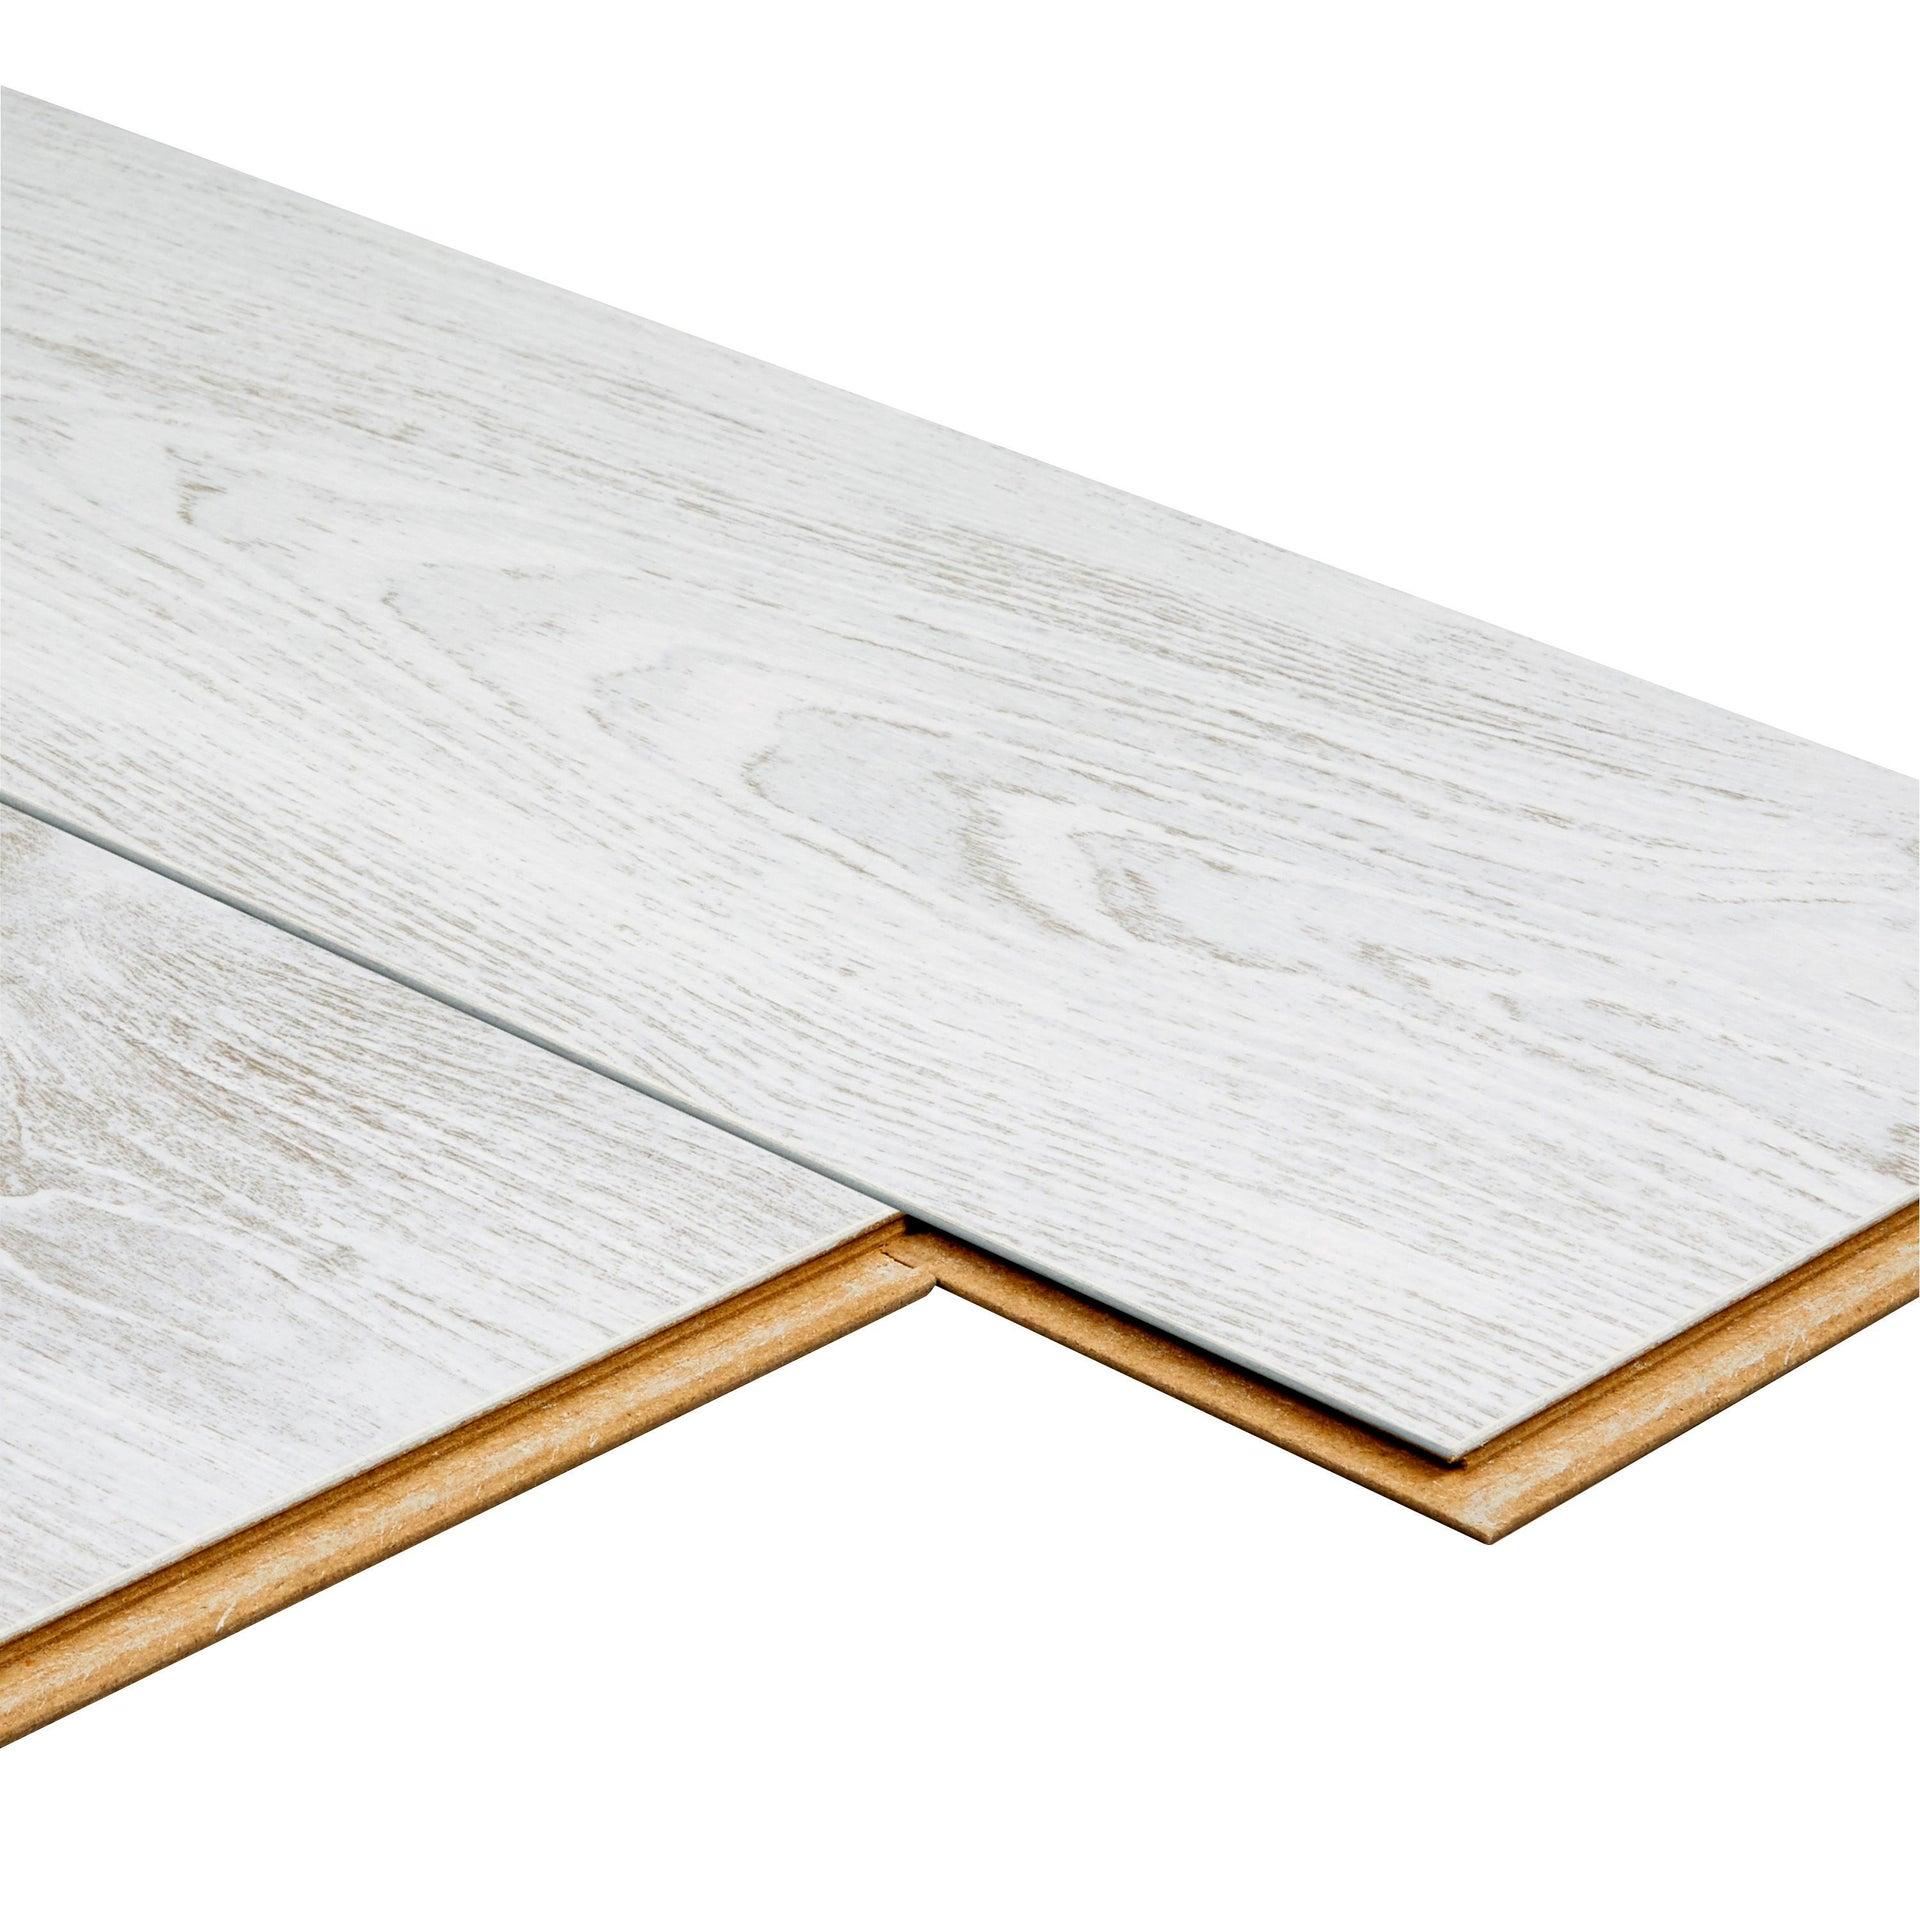 Pavimento laminato Nuiza Sp 8 mm beige - 6